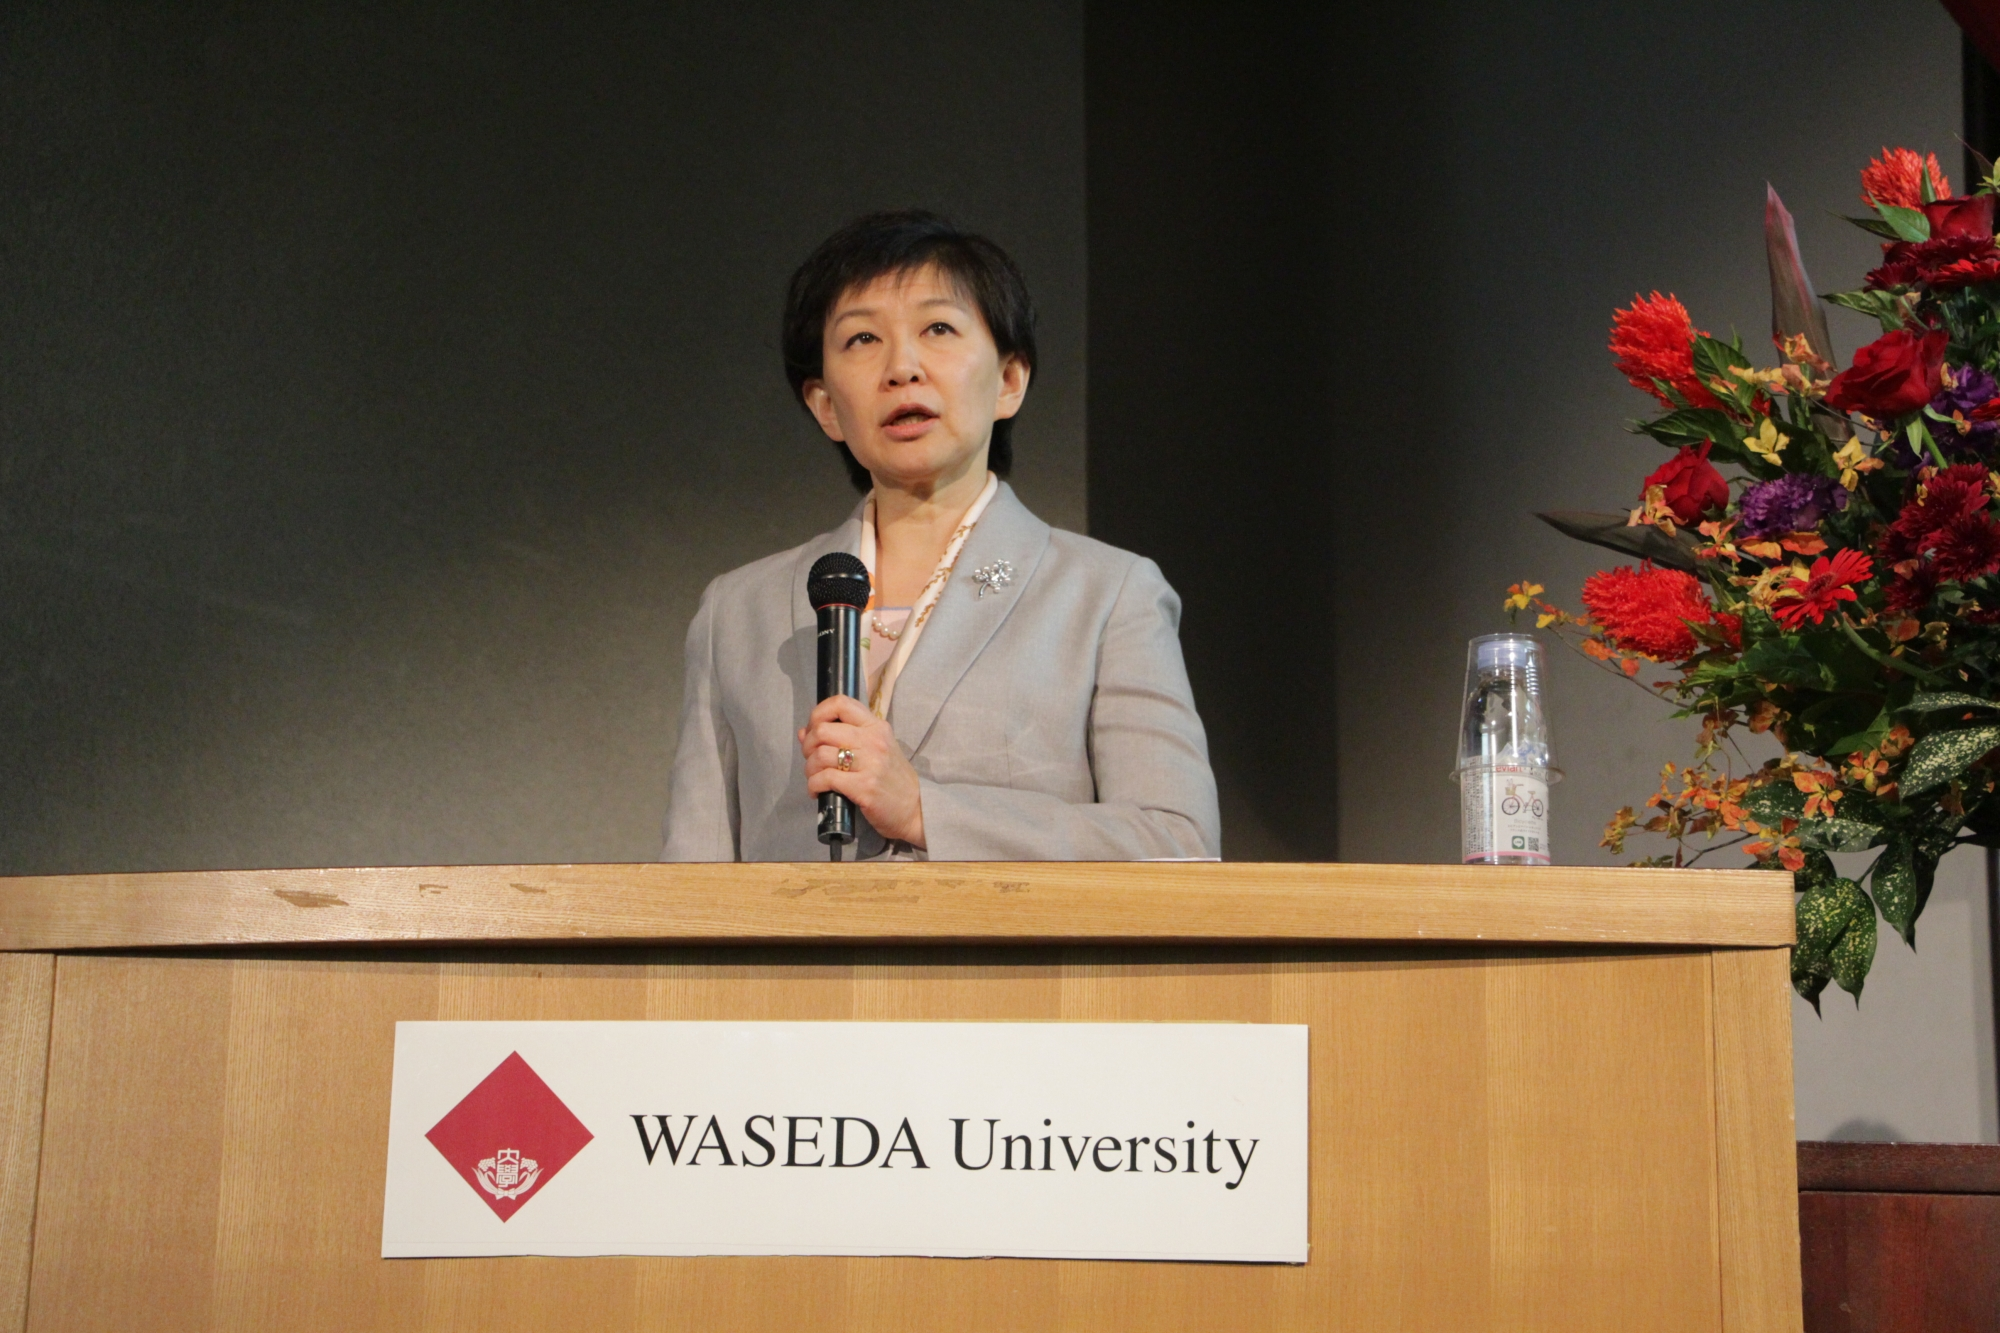 UNDP隰ヲ・ョ陟厄スア陷€蜥乗d繝サ繝サll reserved by UNDP繝サ繝サlecture-at-waseda-university_31167266082_o